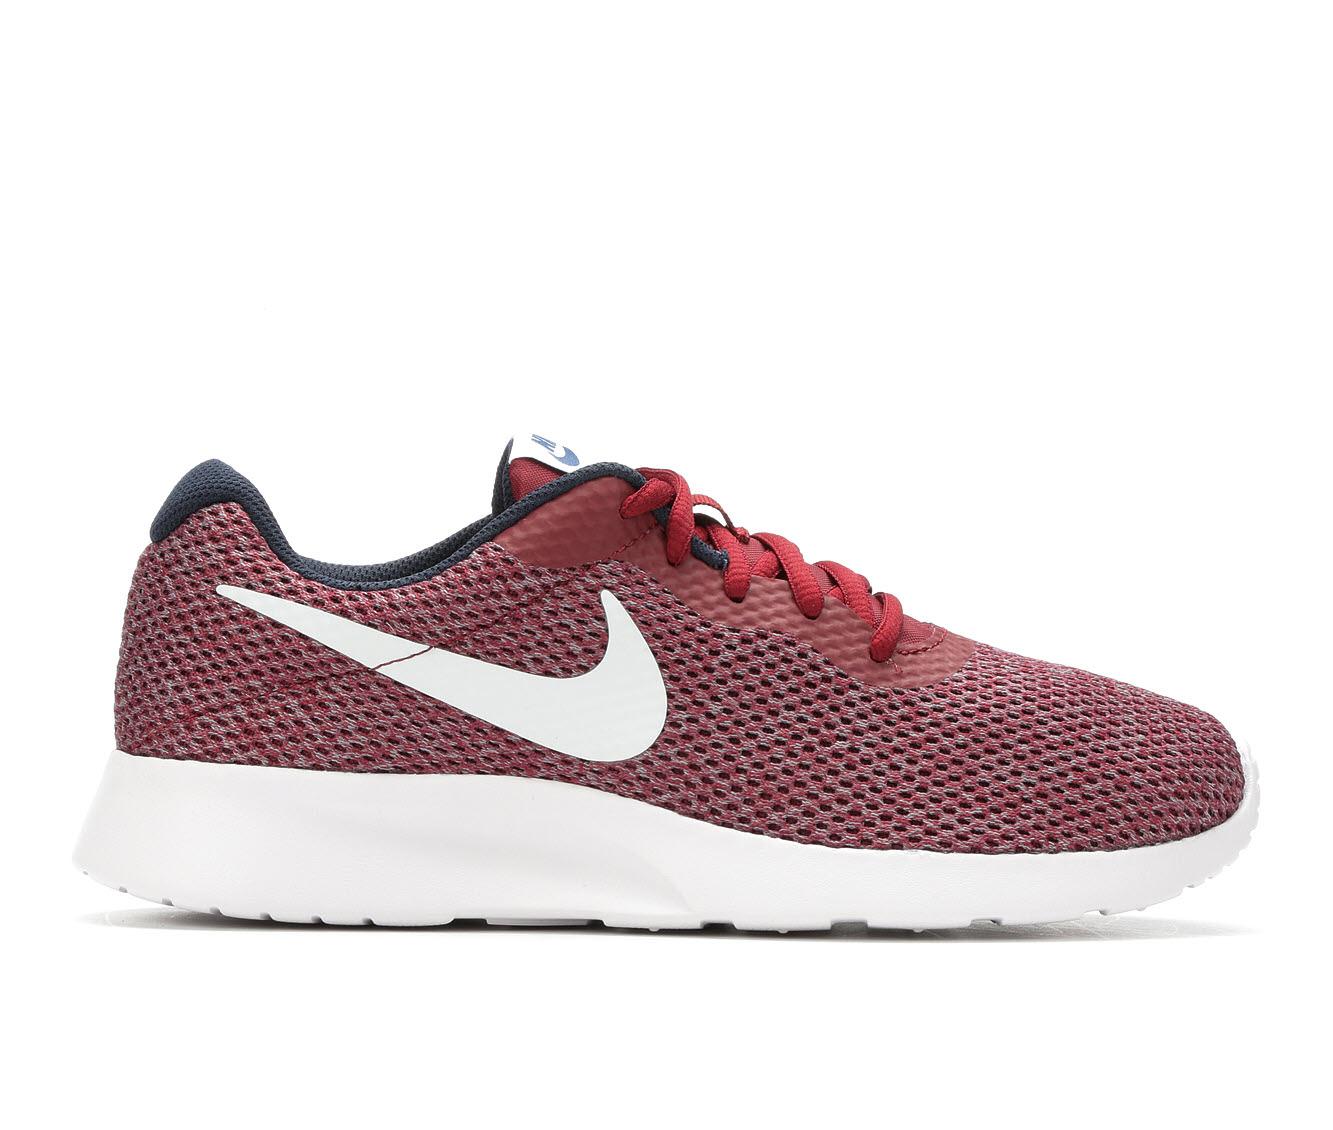 Men's Nike Tanjun SE Sneakers (Red - Size 11.5) 1697842